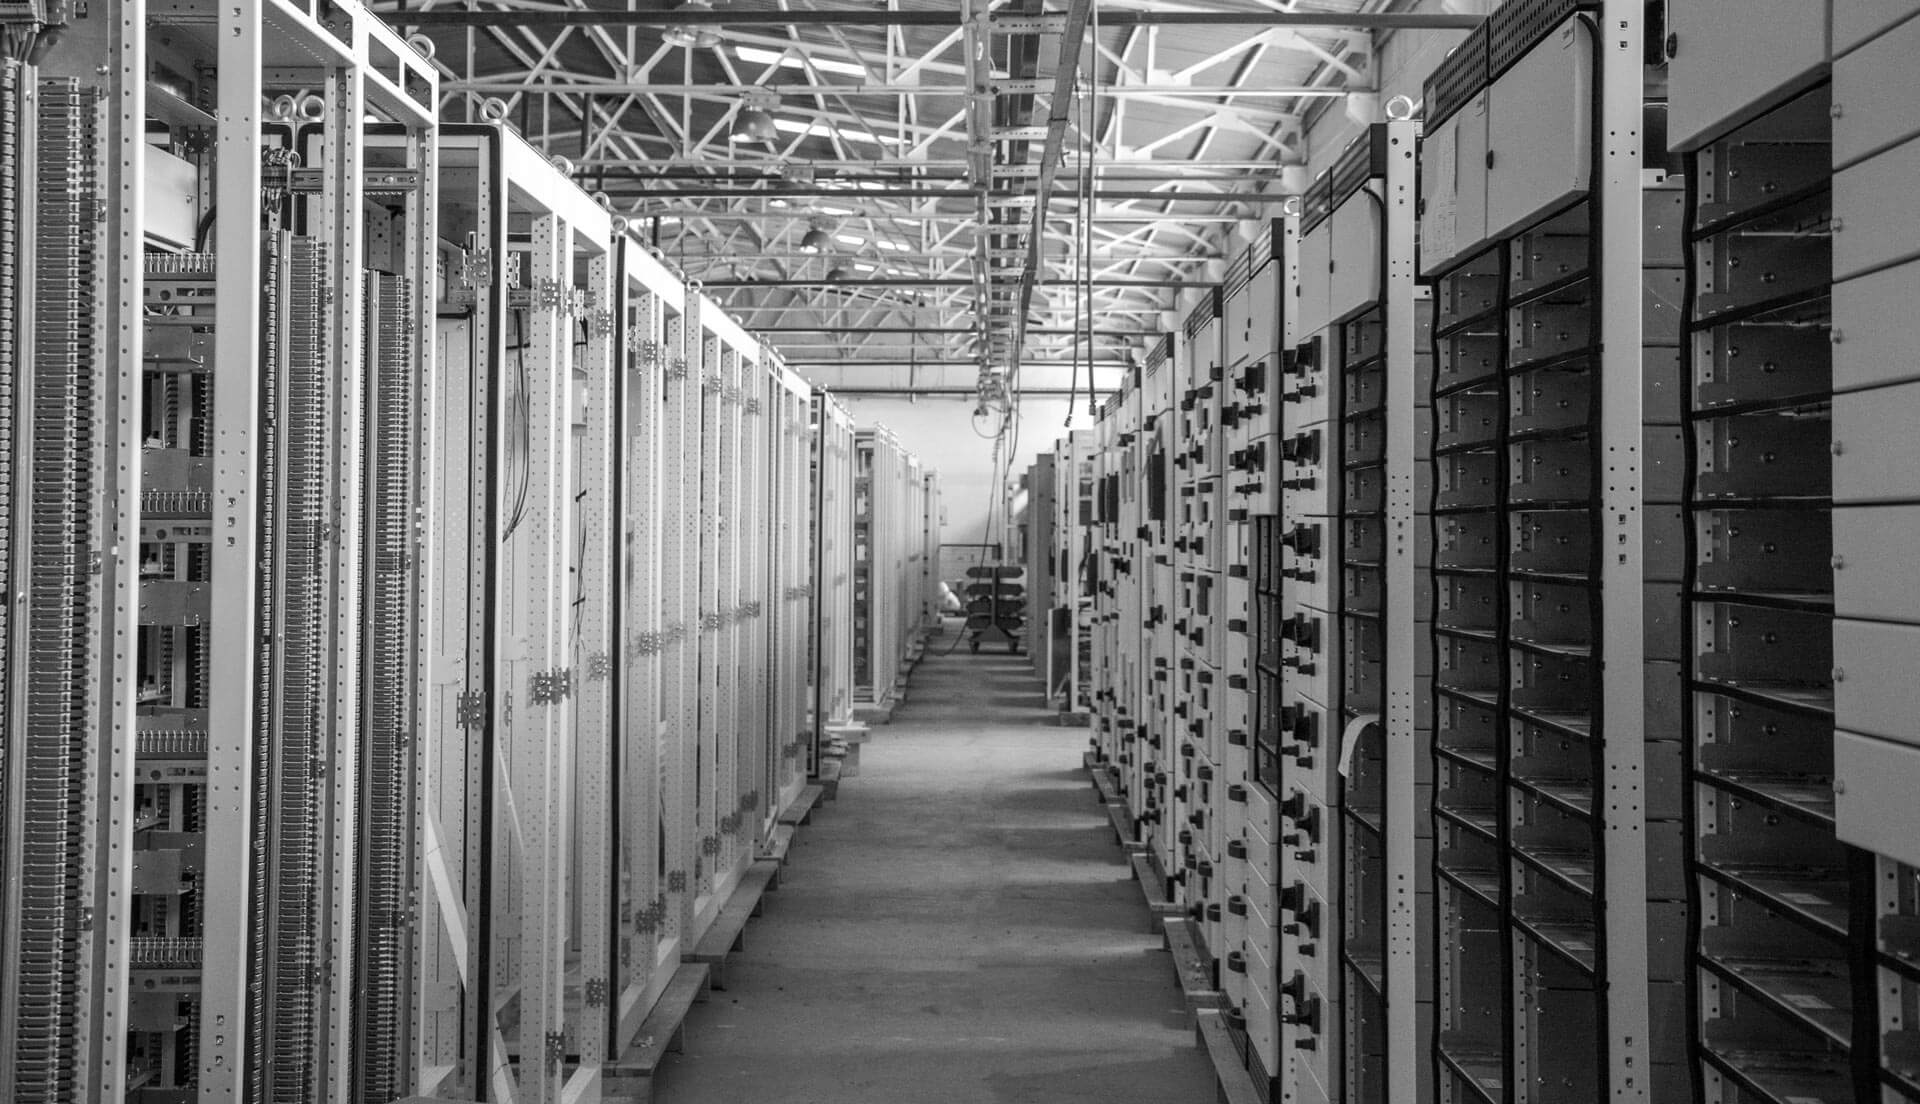 Room of machines.